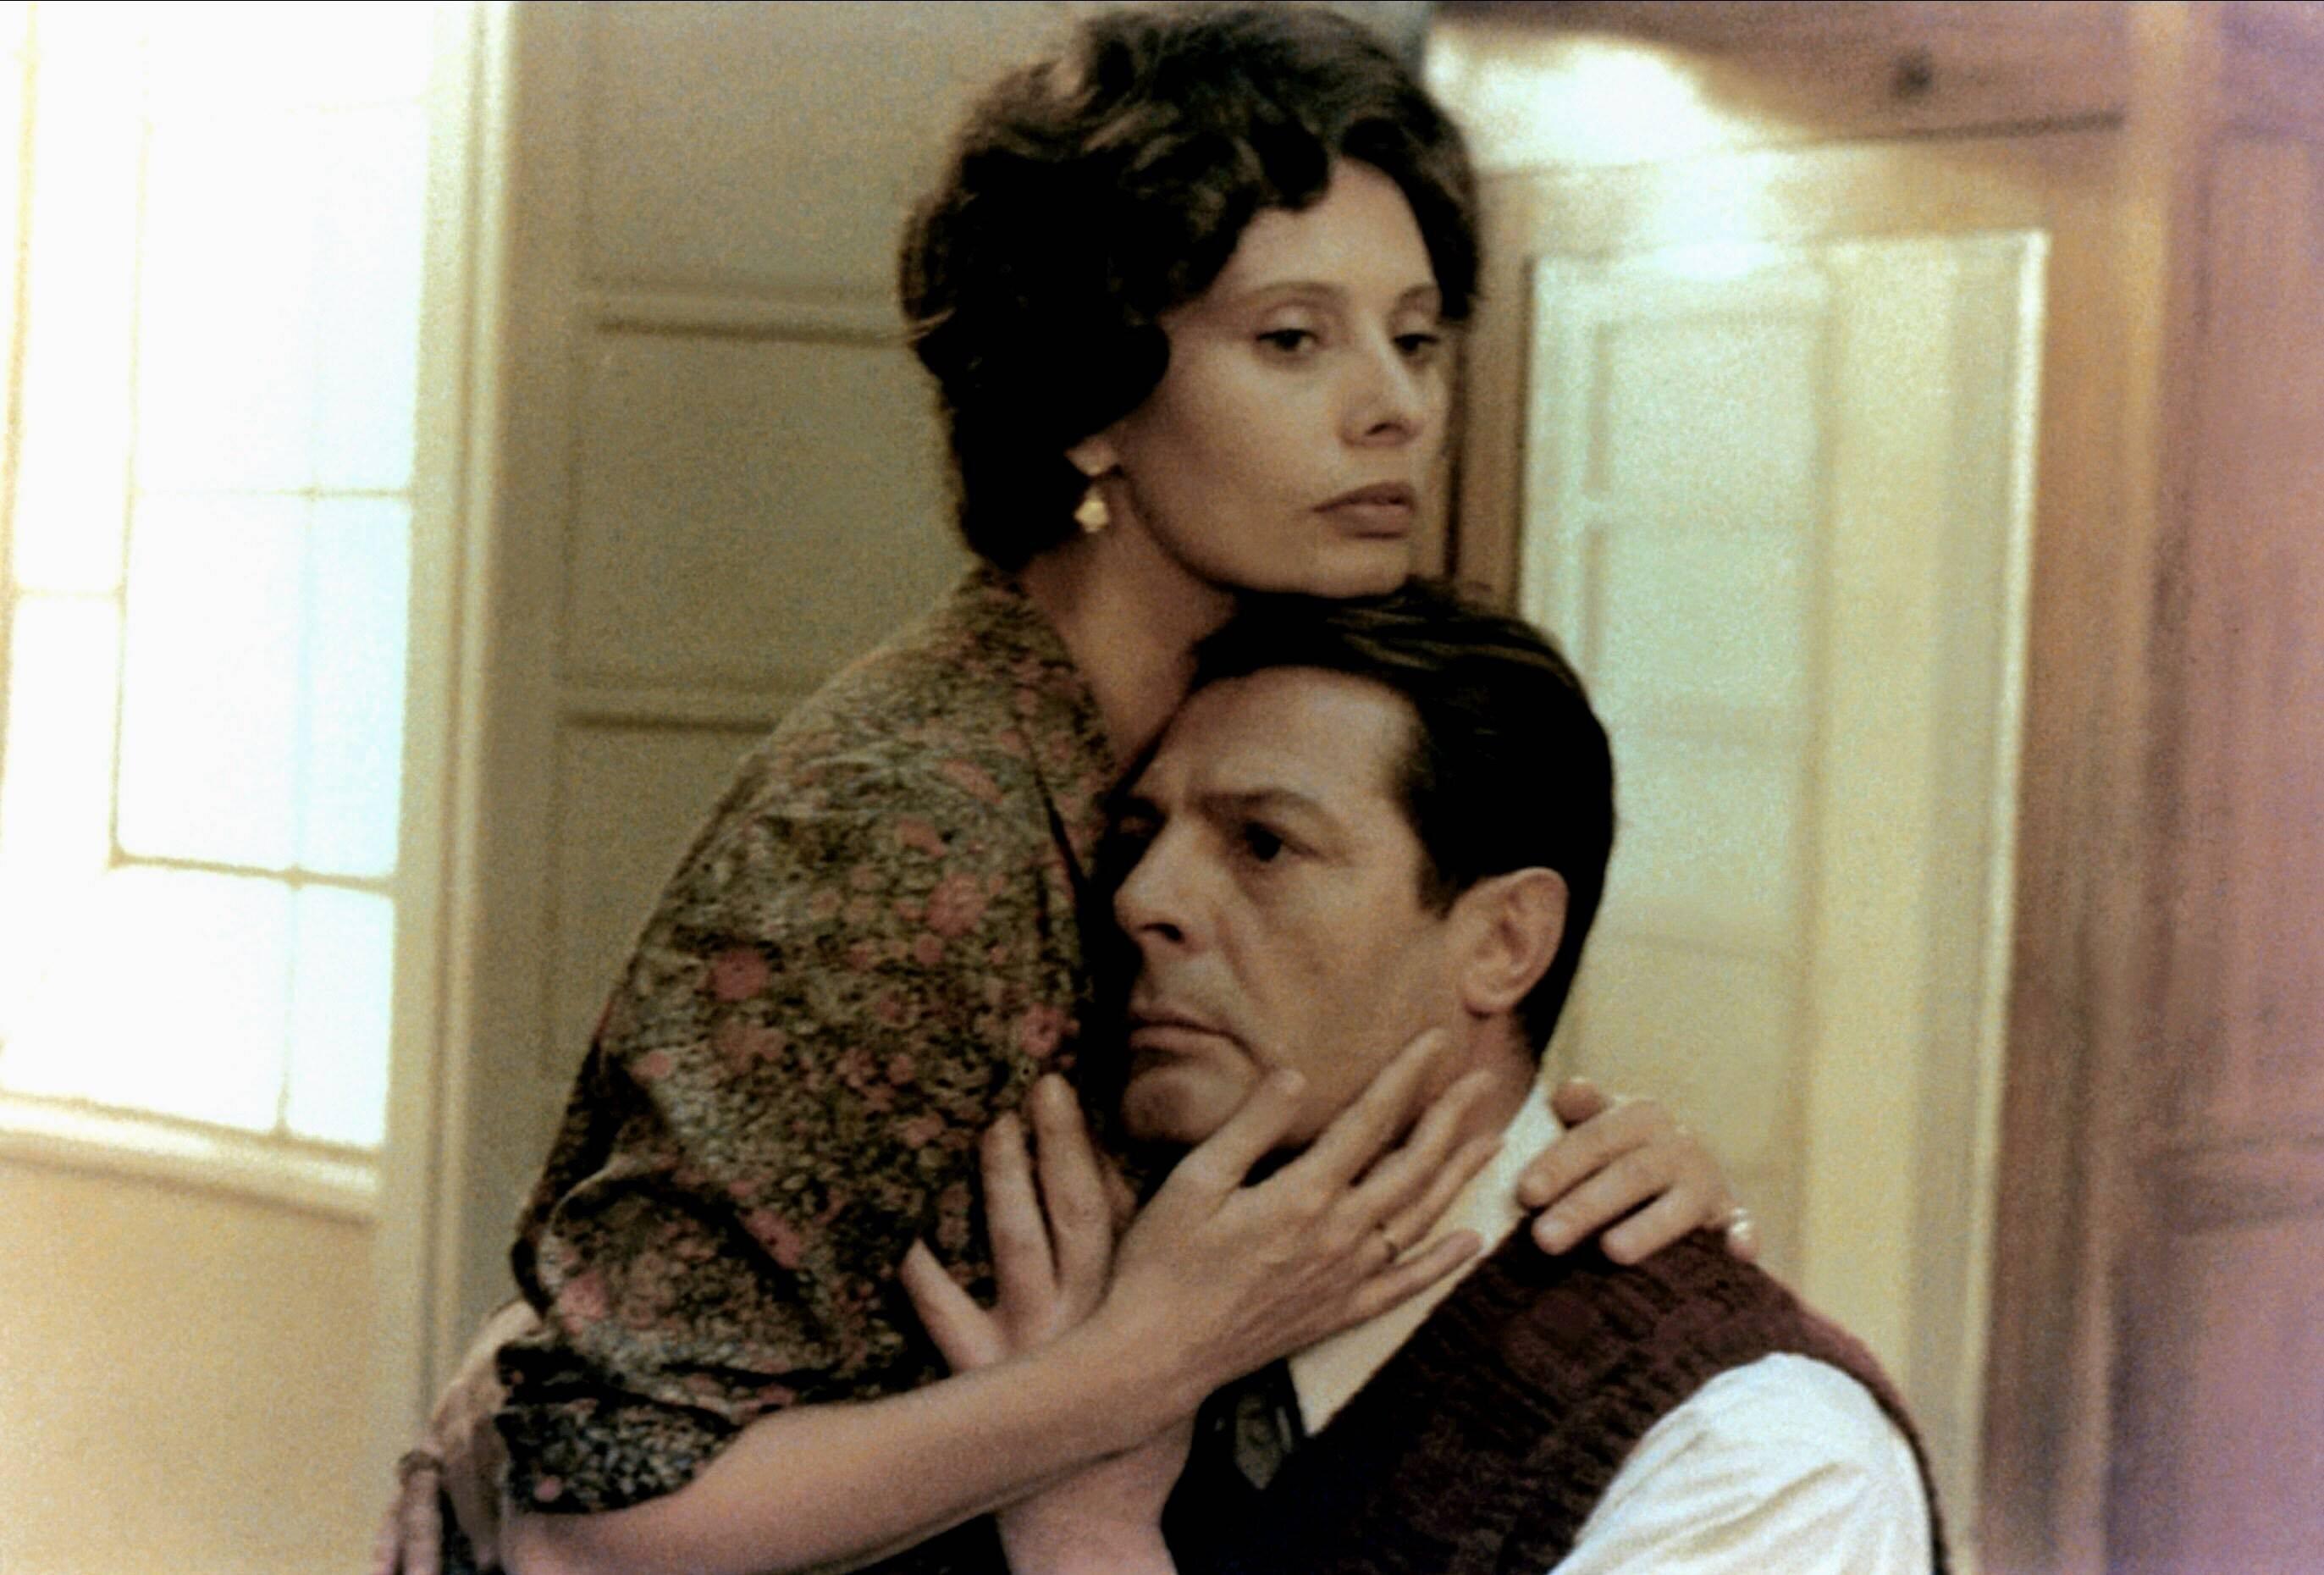 Es ist anders: Sophia Loren und Marcello Mastroinanni (imago/Mary Evans)